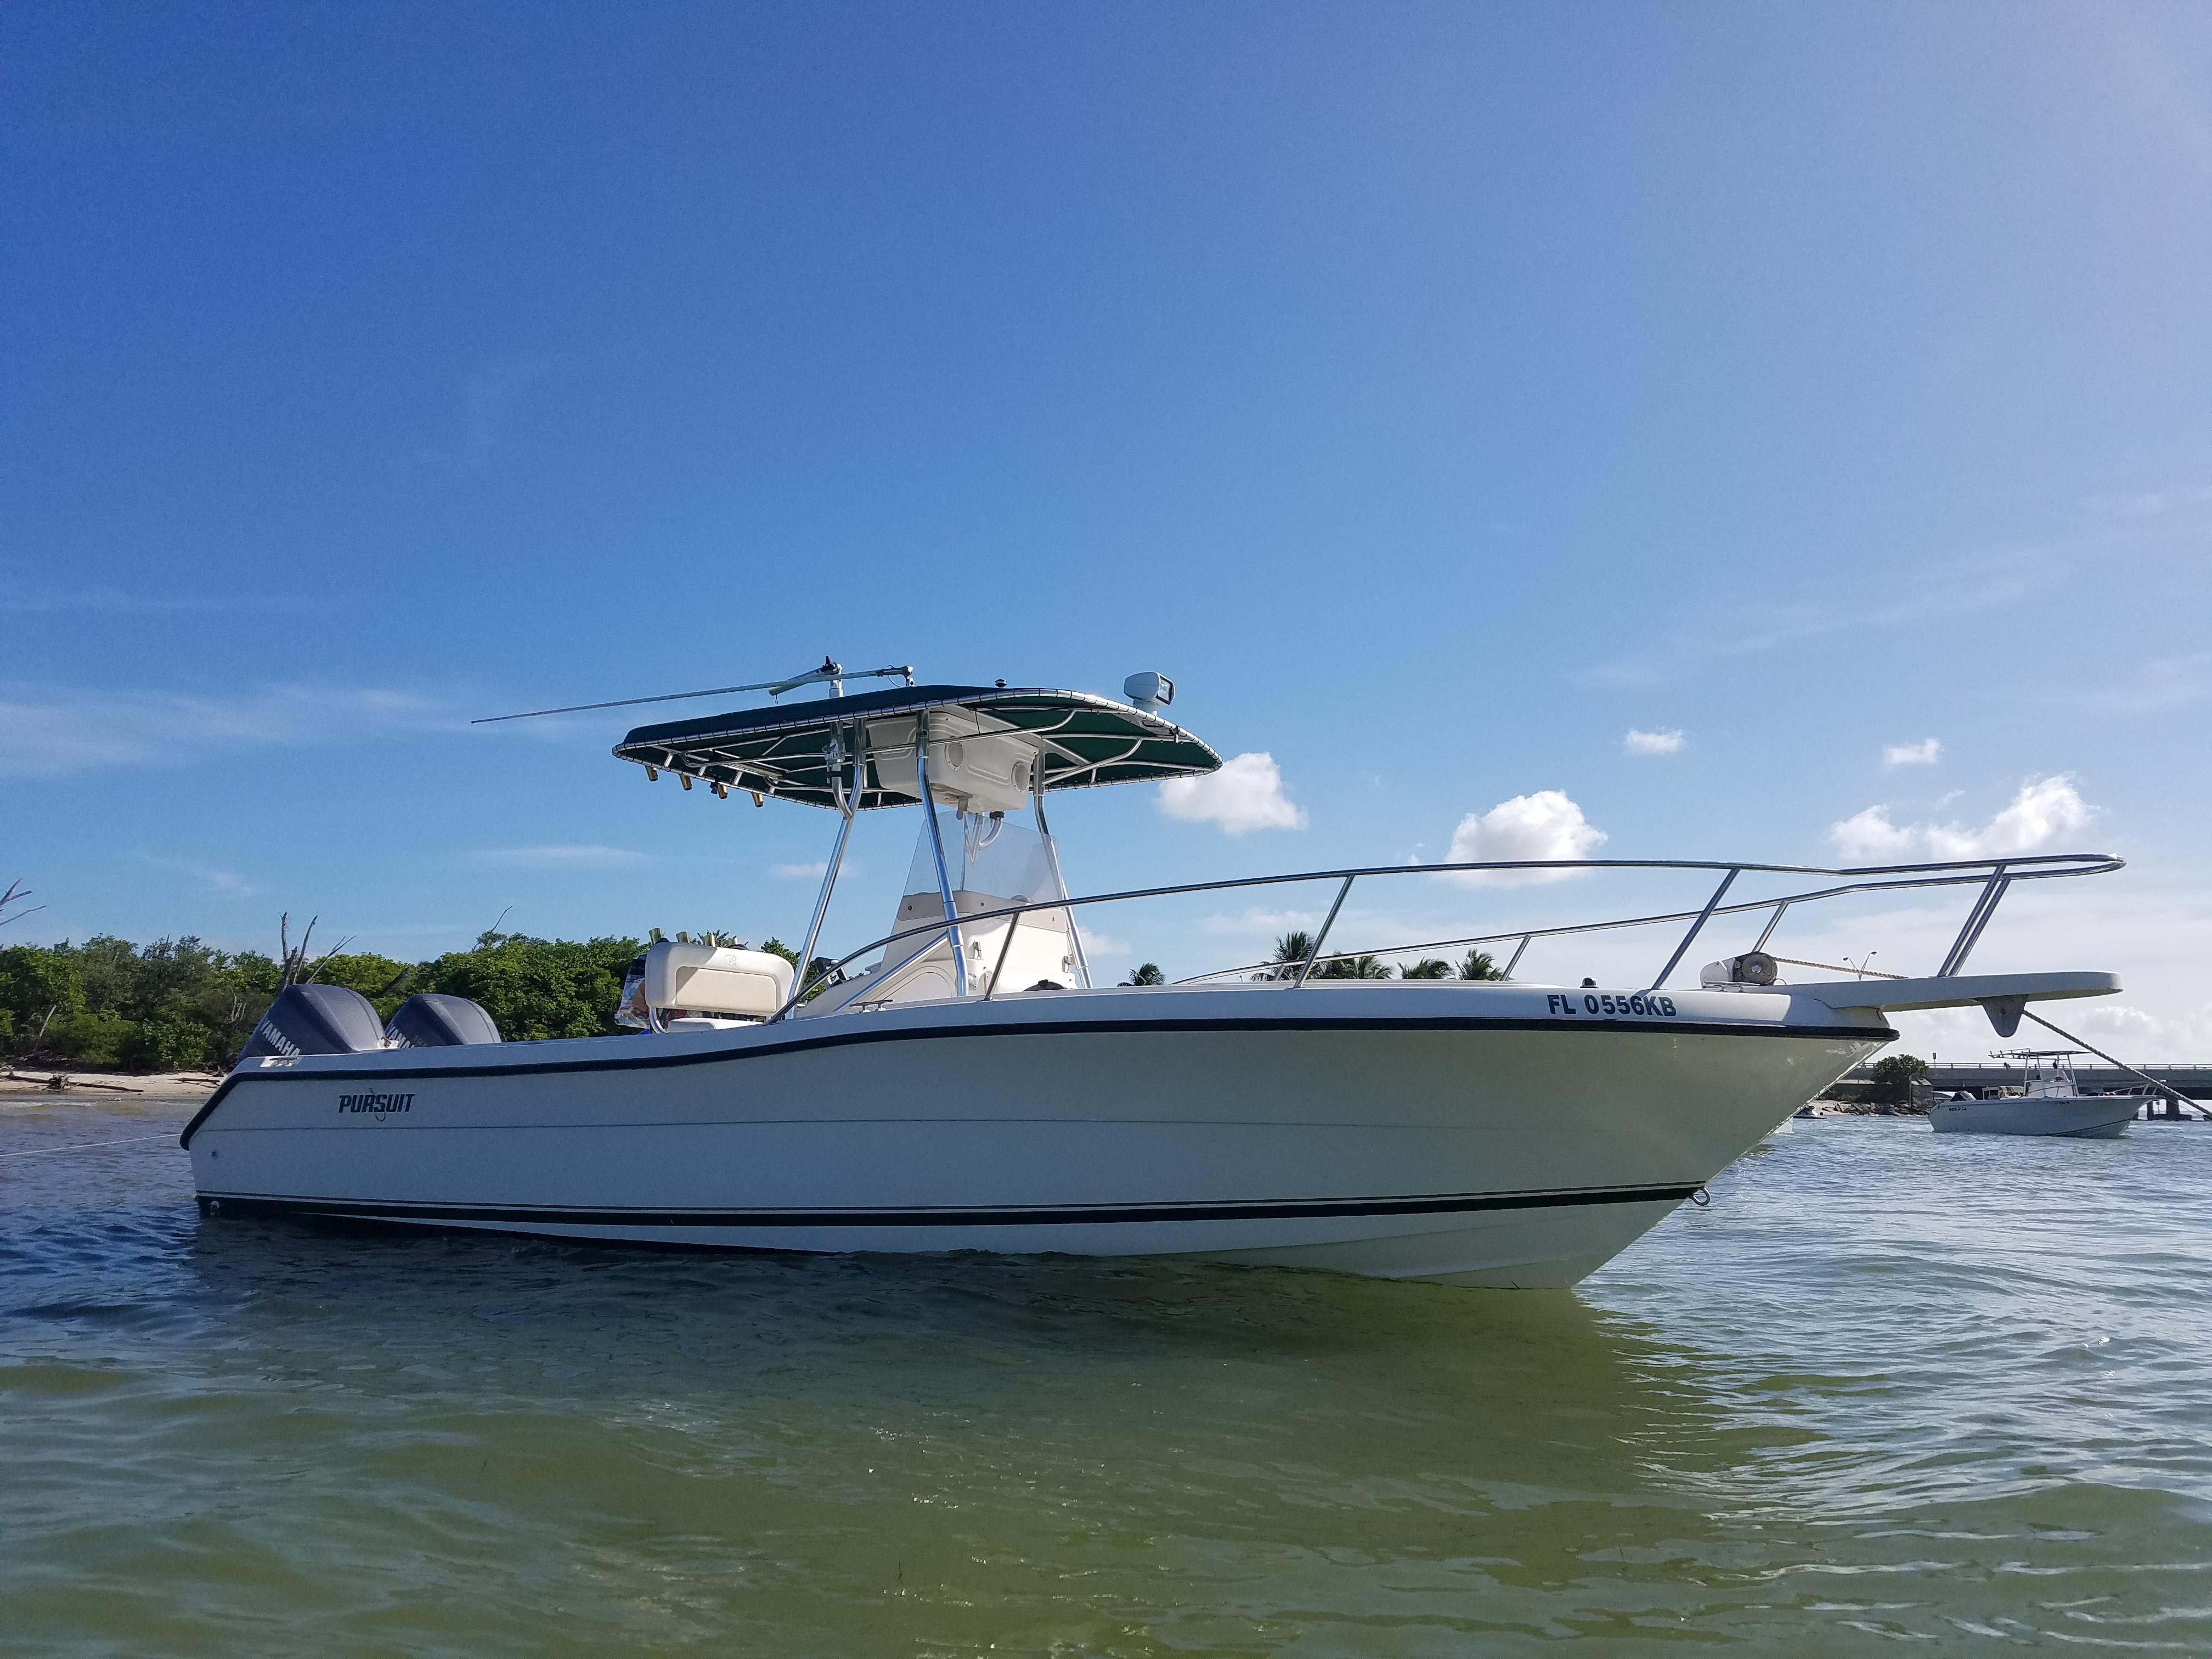 1997 Pursuit 2470 Center Console Power Boat For Sale Www